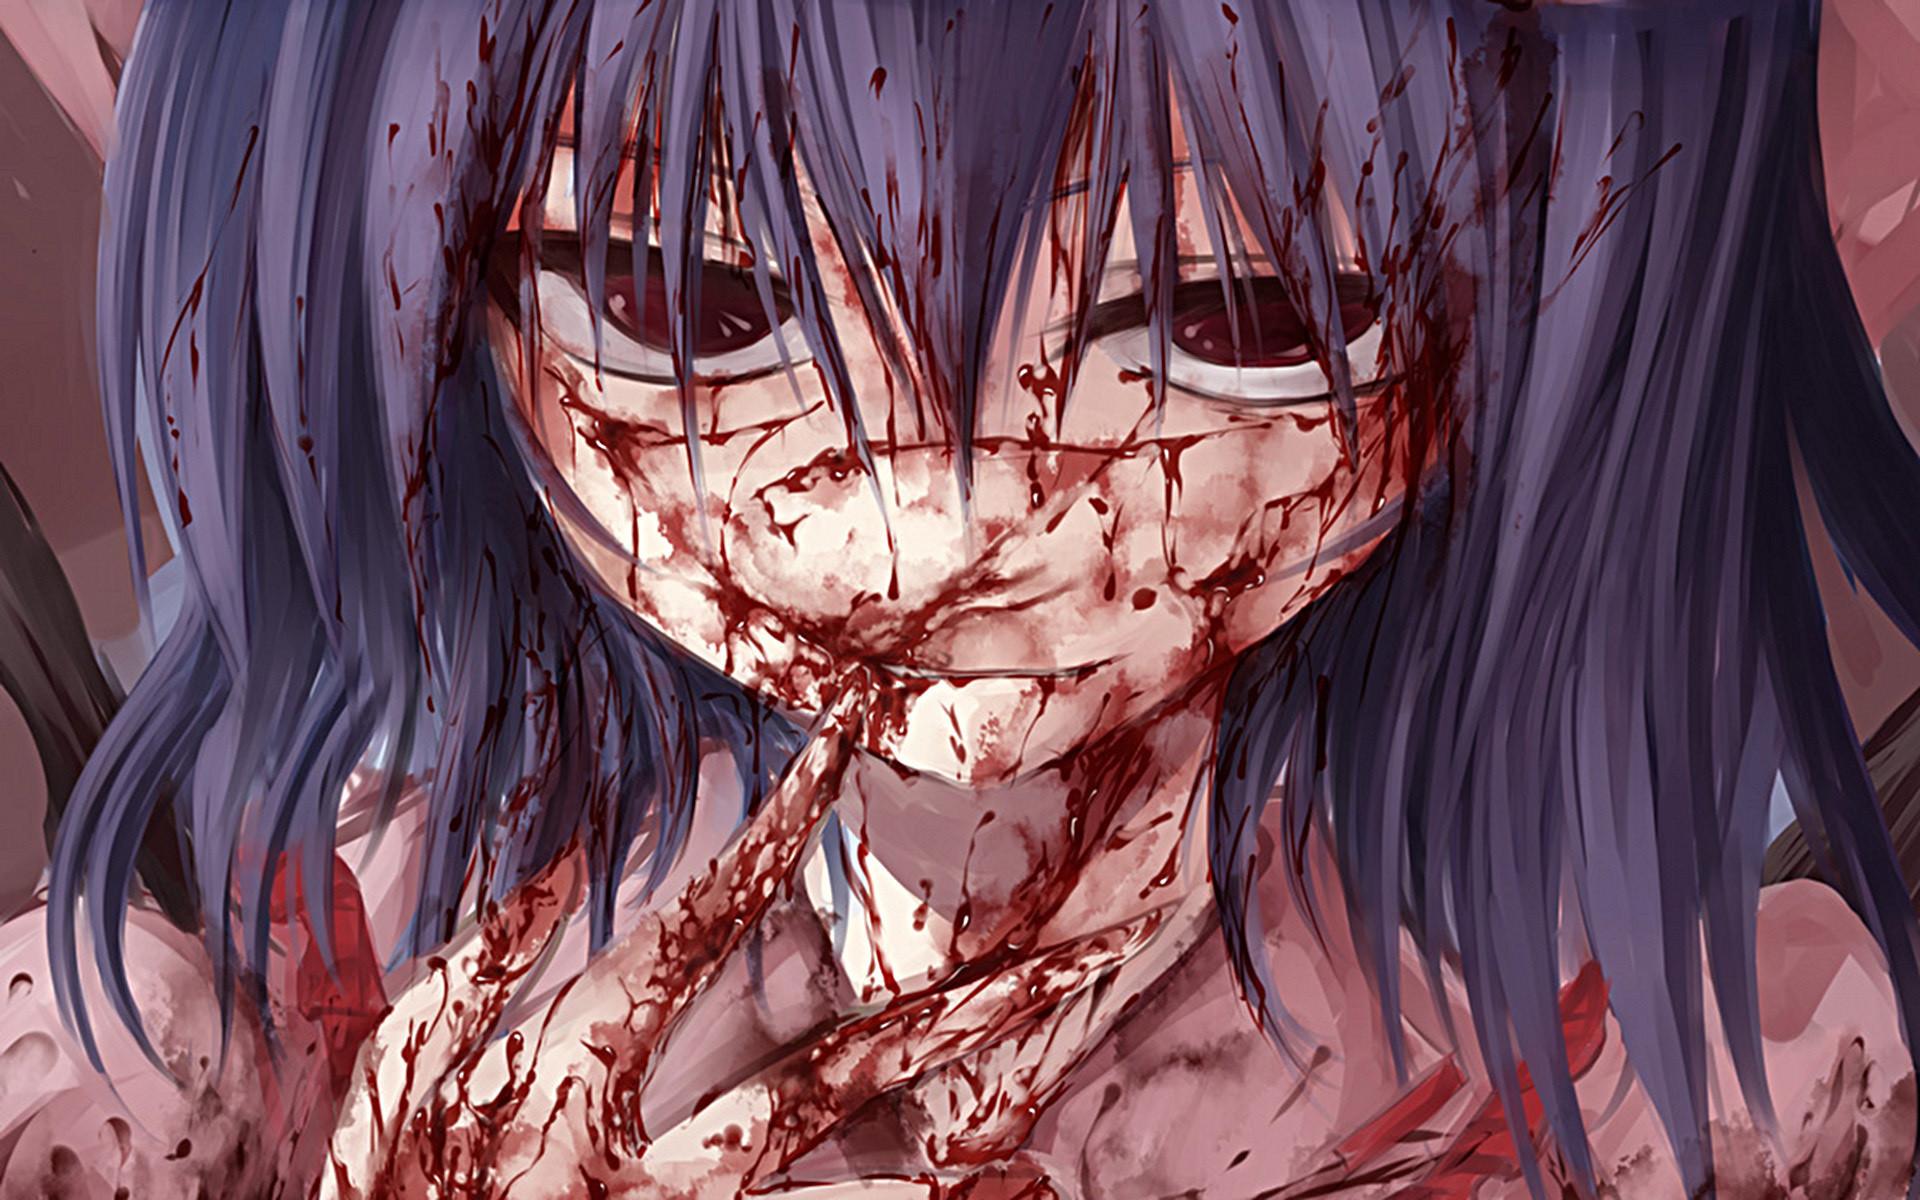 Image creepy anime girl jpg creepypasta x 853 px